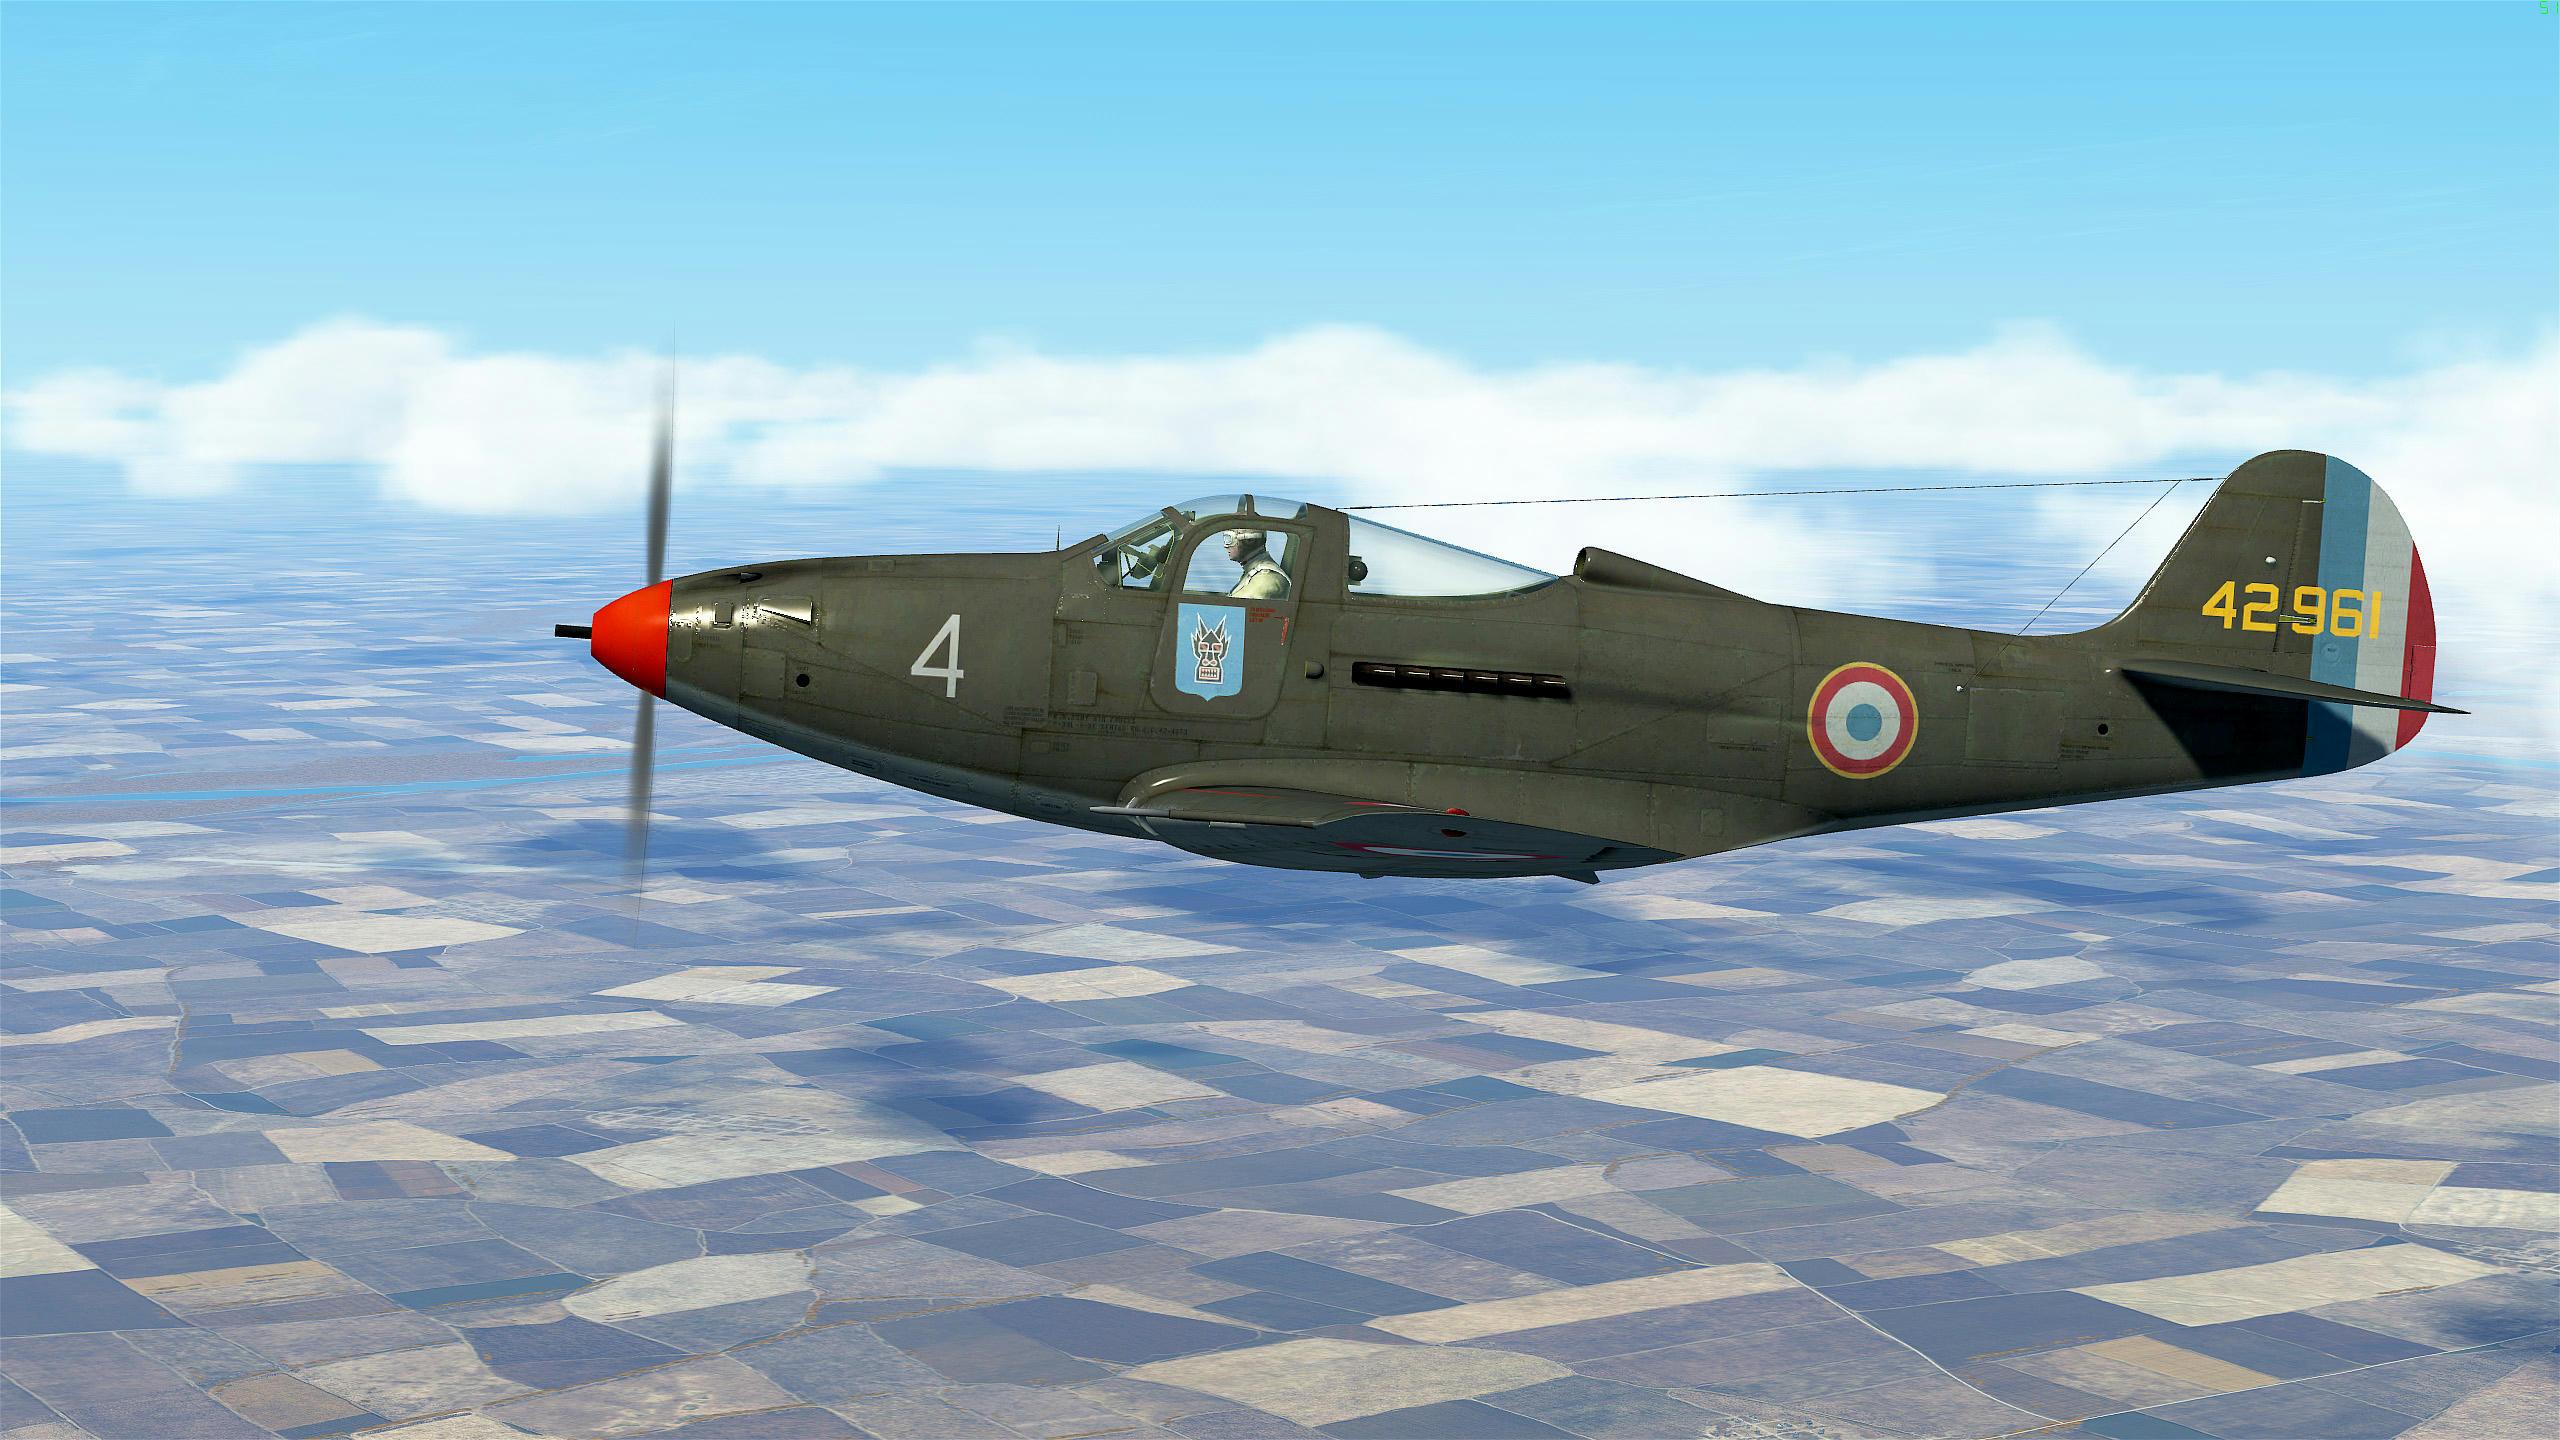 PACK P-39 FRANCAIS Czx8banajp0xha4zg